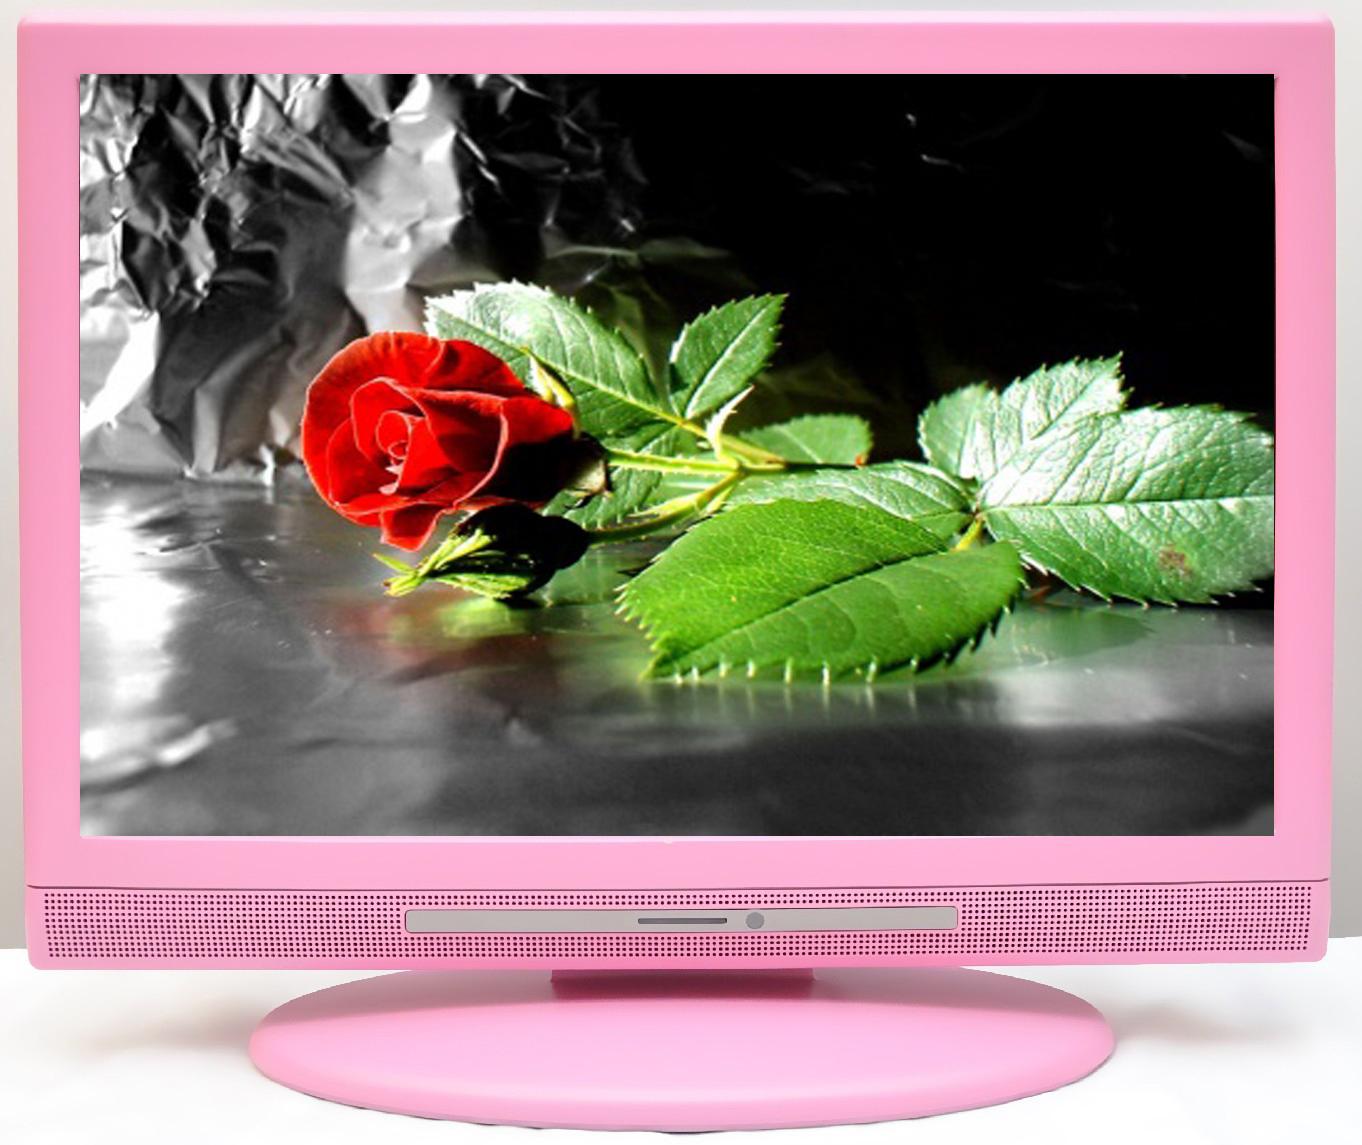 19 Zoll HD Ready LCD-Fernseher